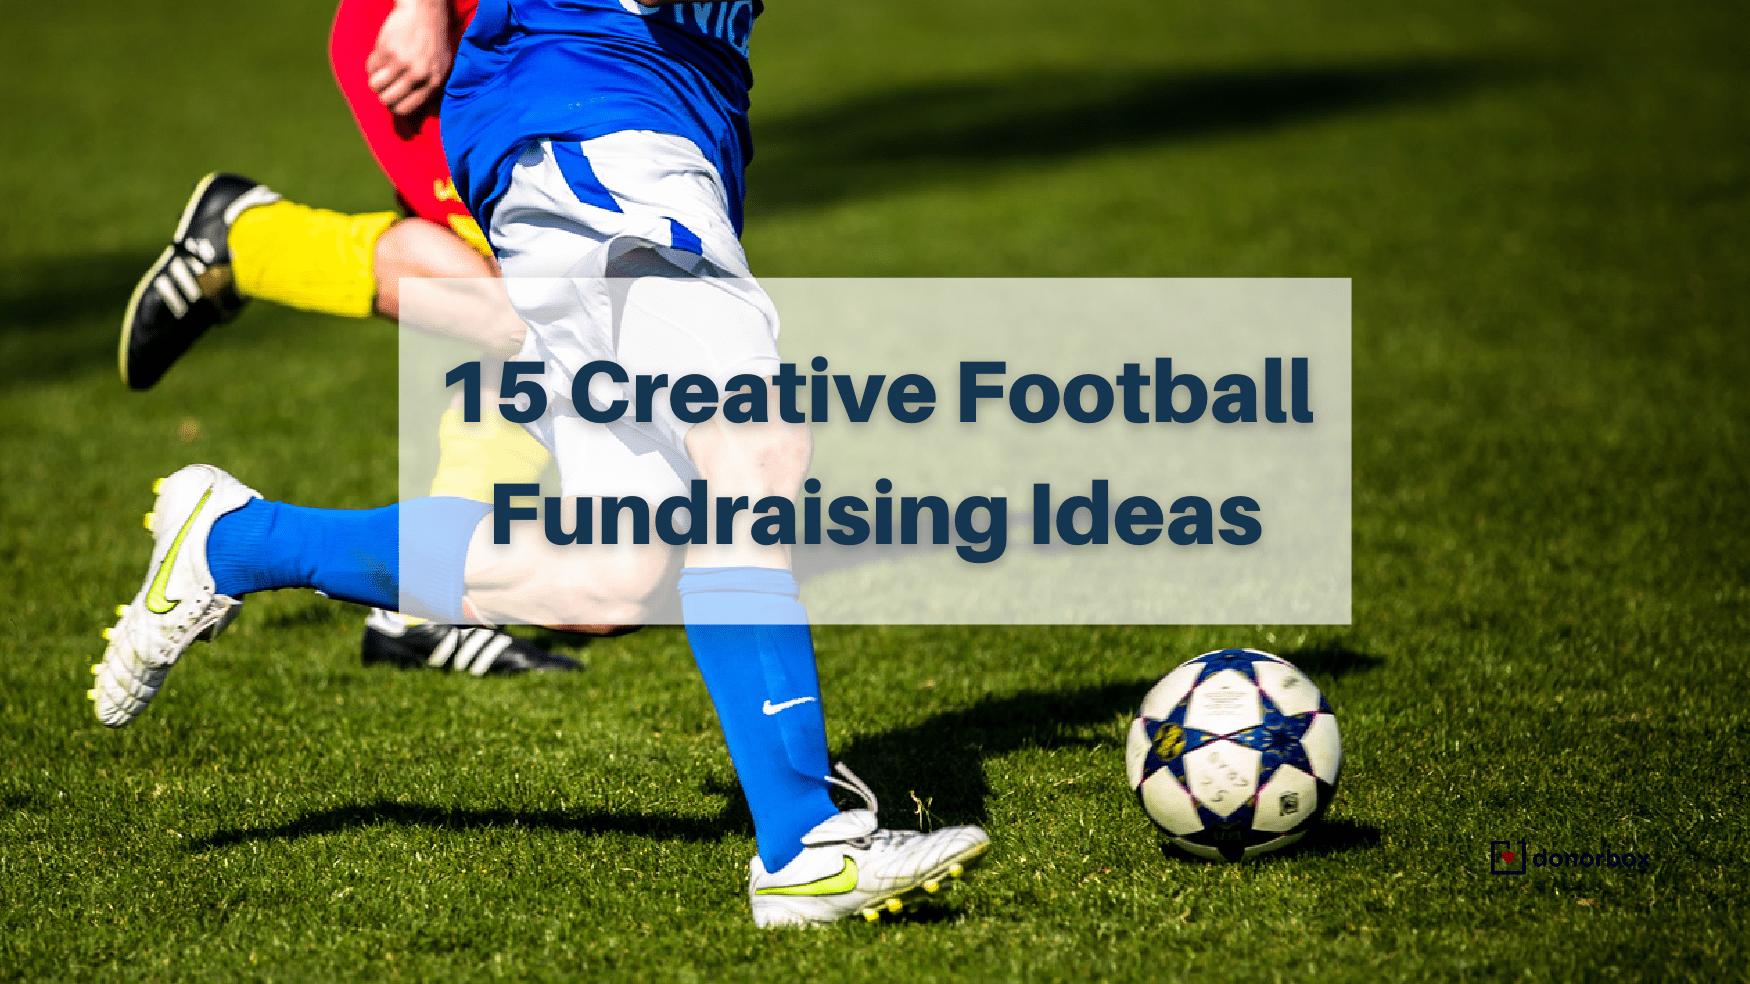 15 Creative Football Fundraising Ideas